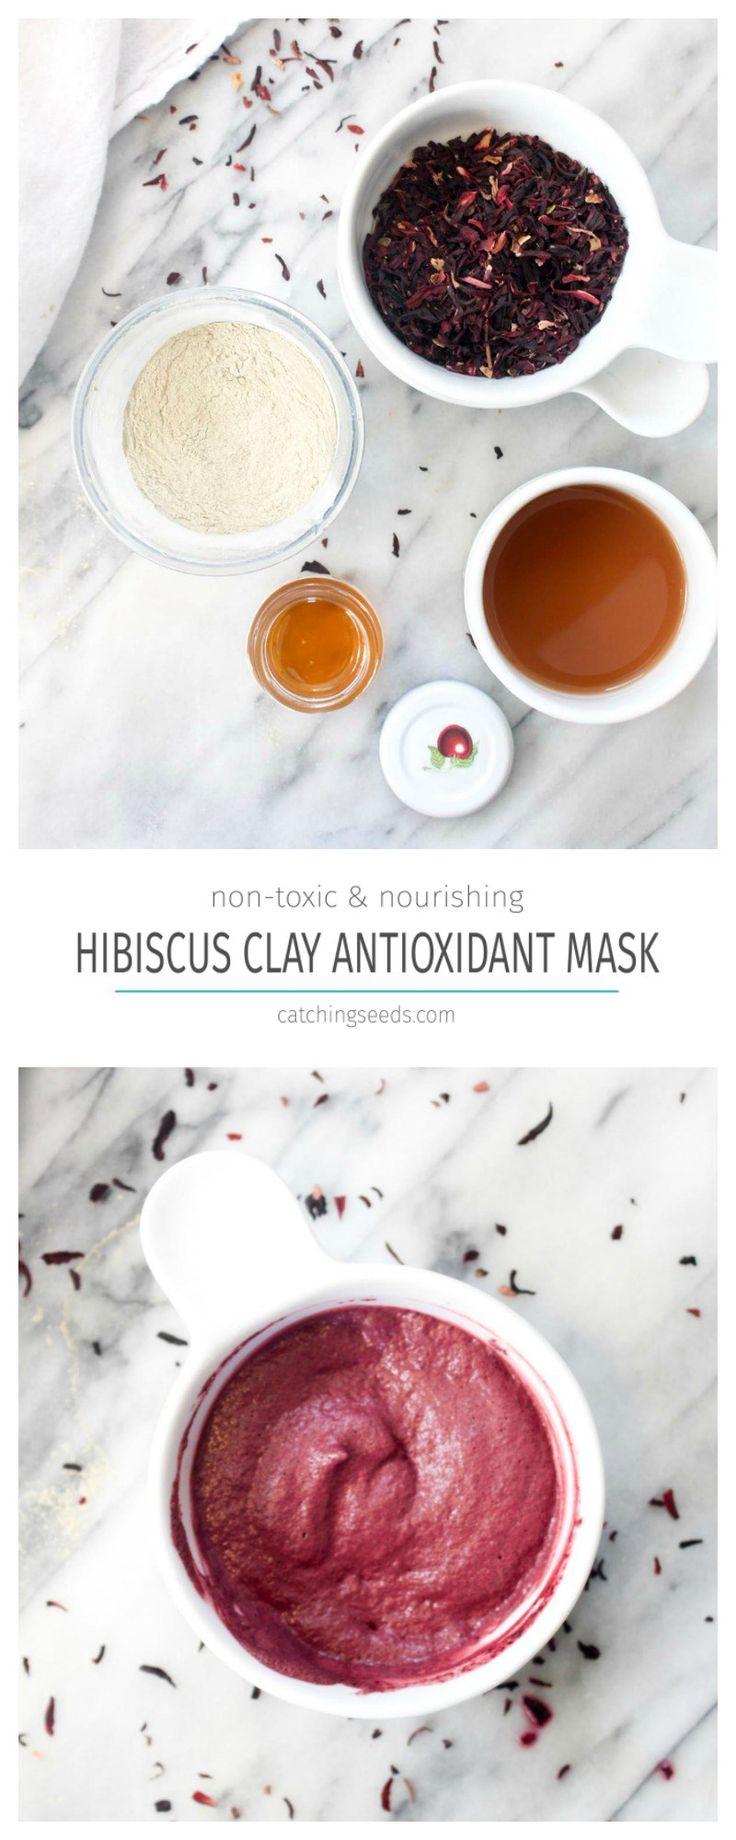 Hibiscus Clay Antioxidant Mask